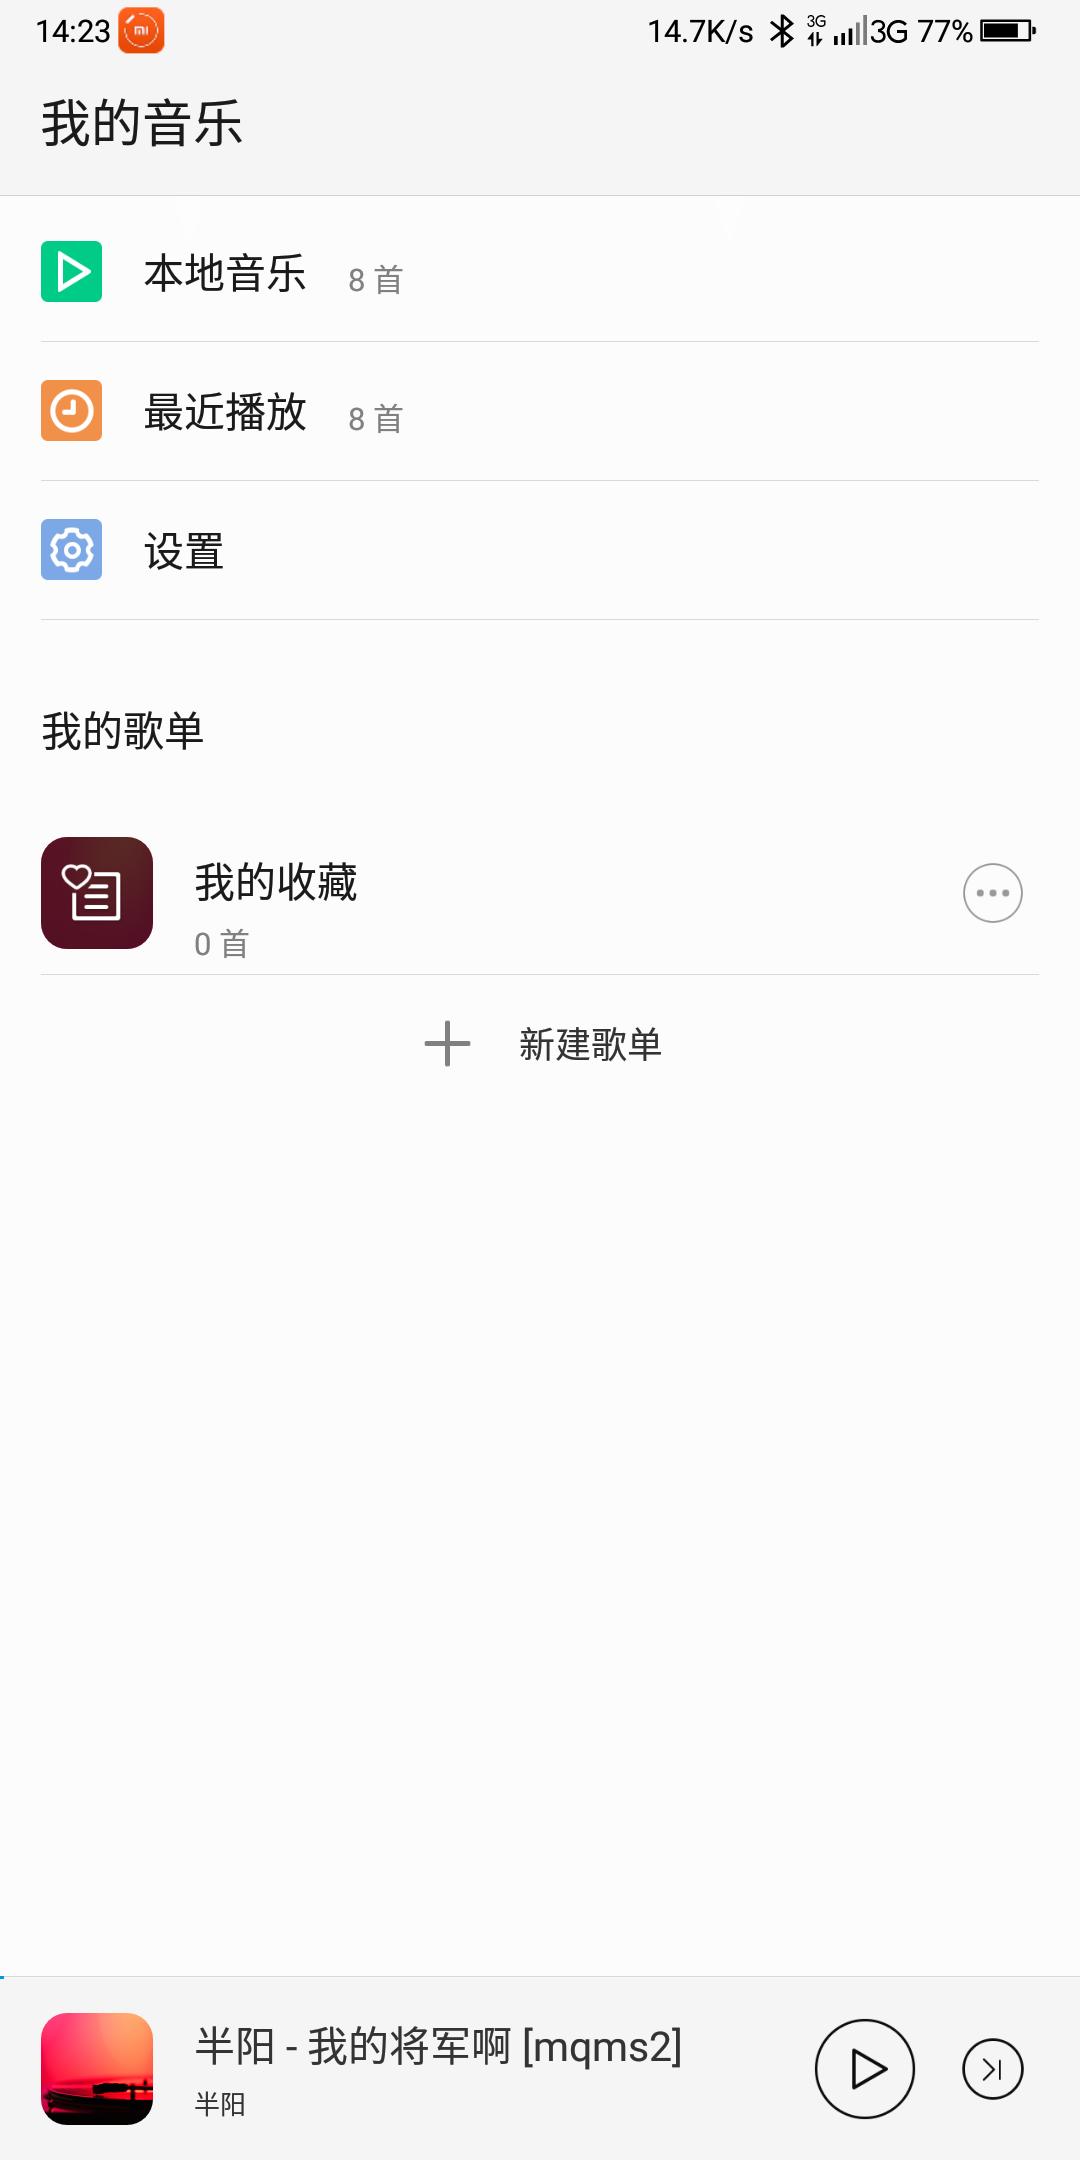 Screenshot_2019-01-12-14-23-48.png